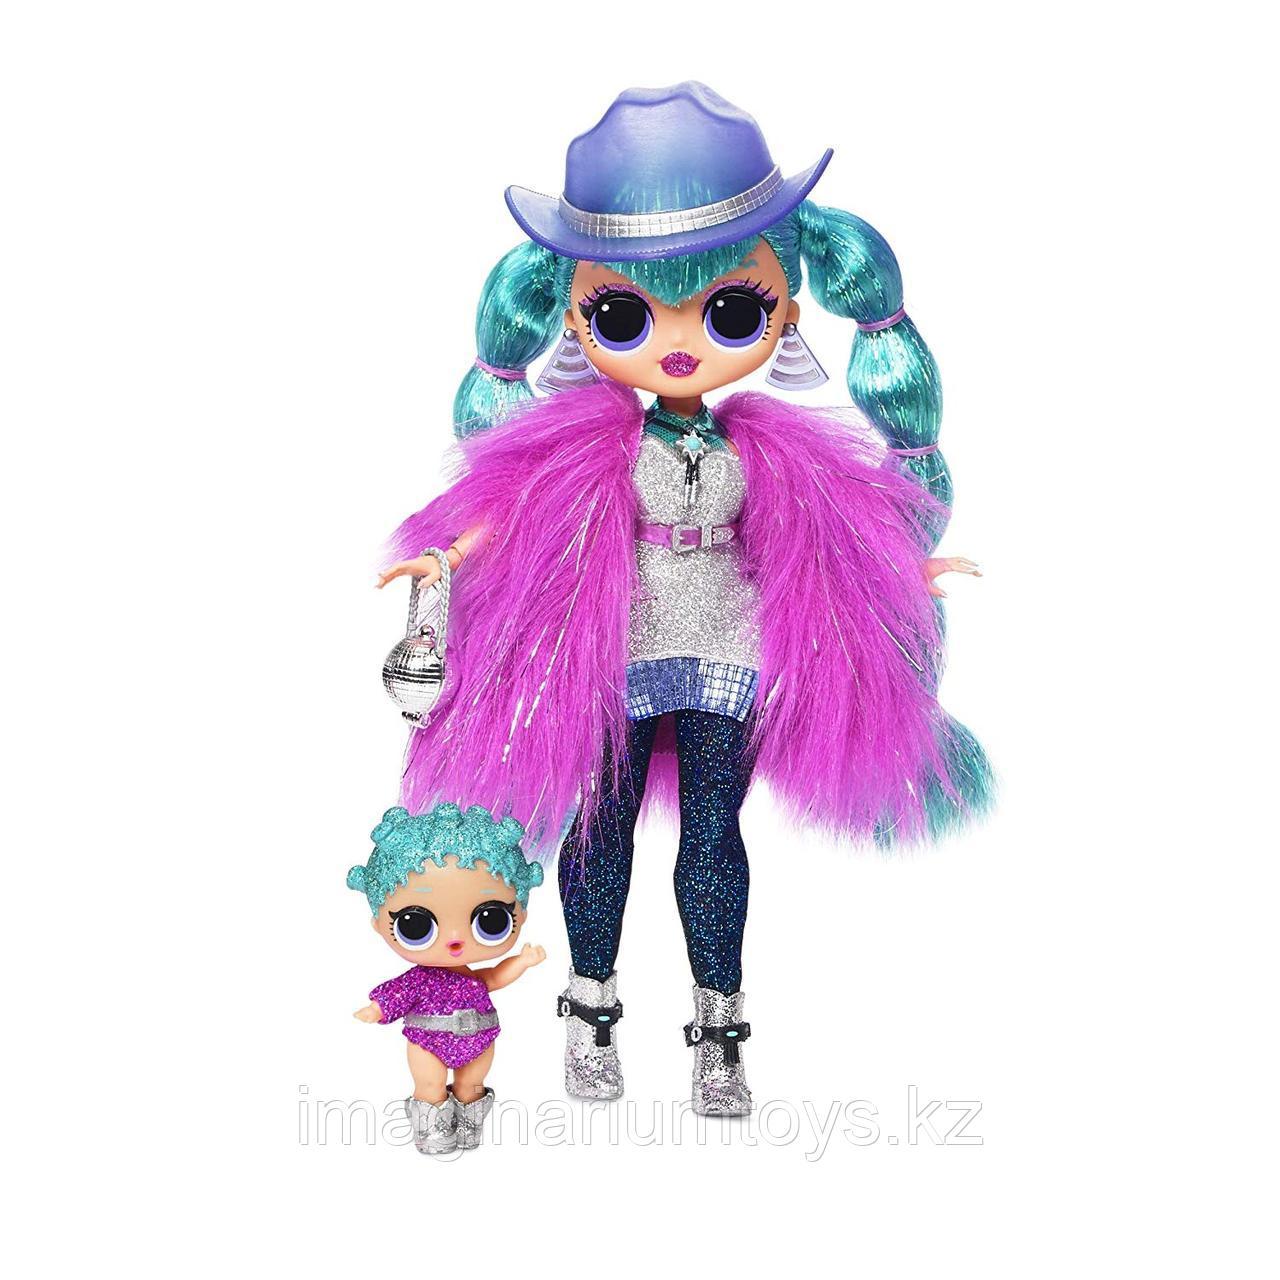 LOL OMG Winter Disco Cosmic Nova большая кукла ЛОЛ 30 см Нова